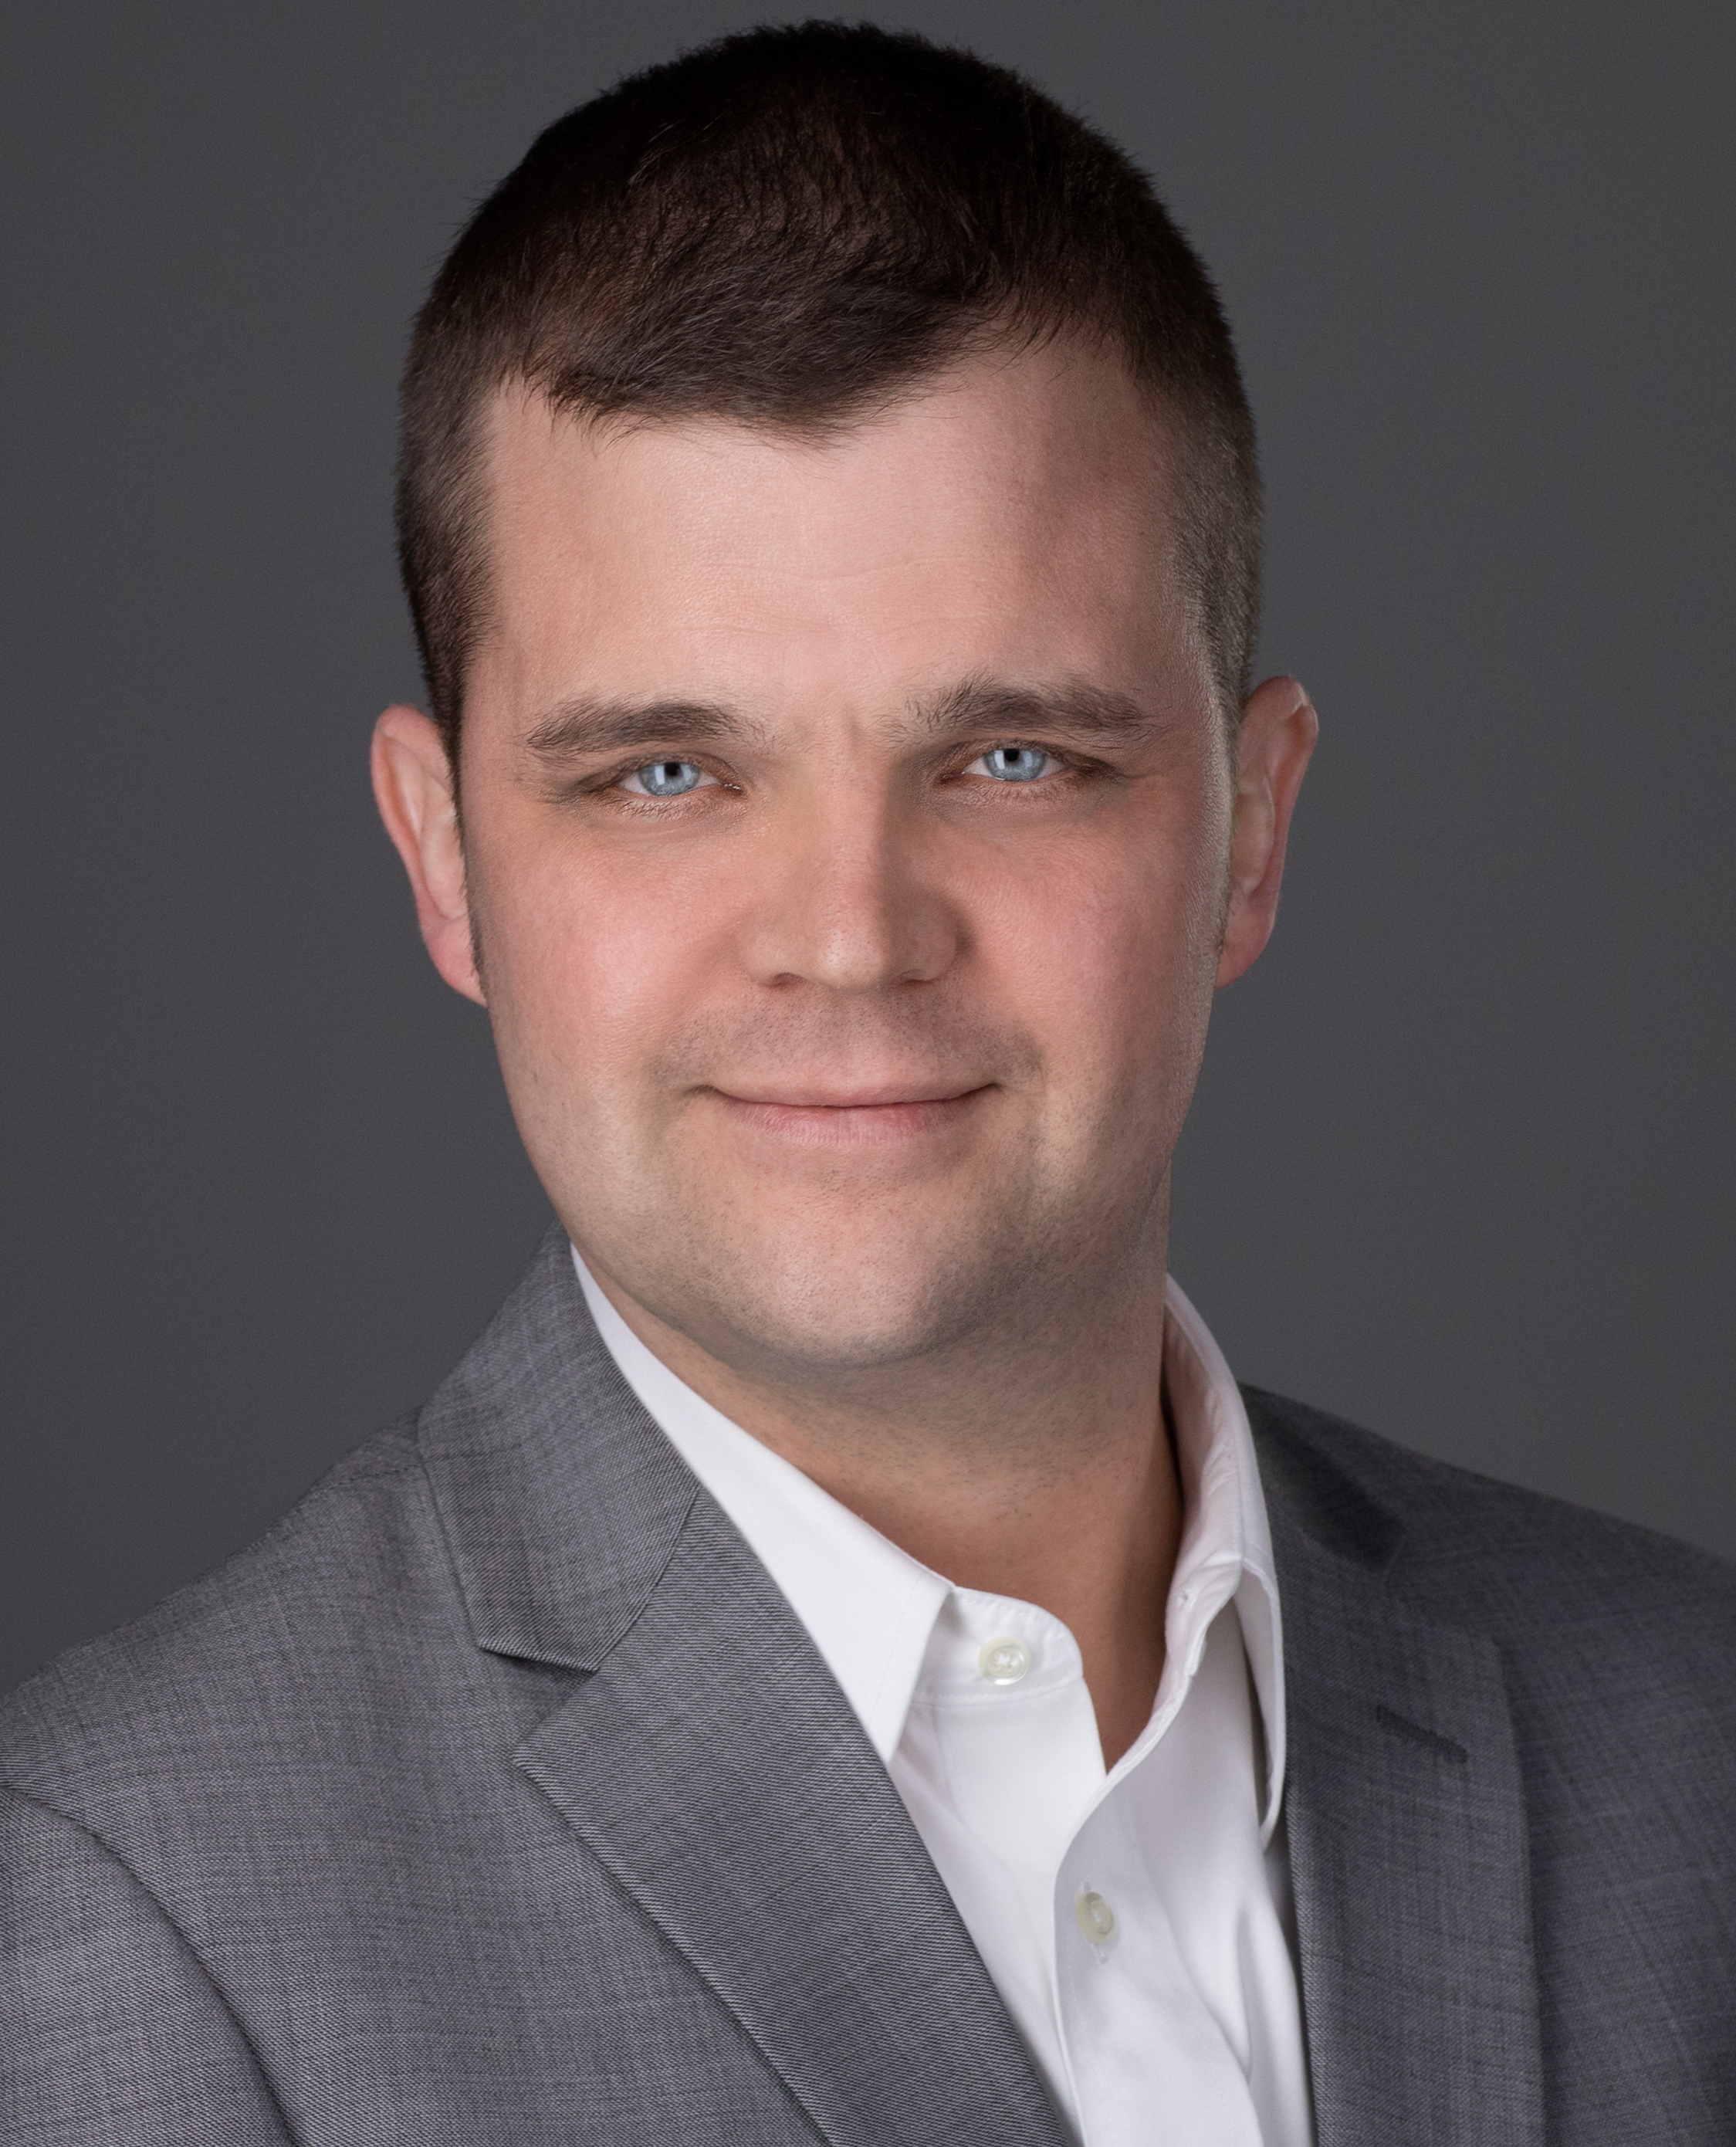 Eric Rowan